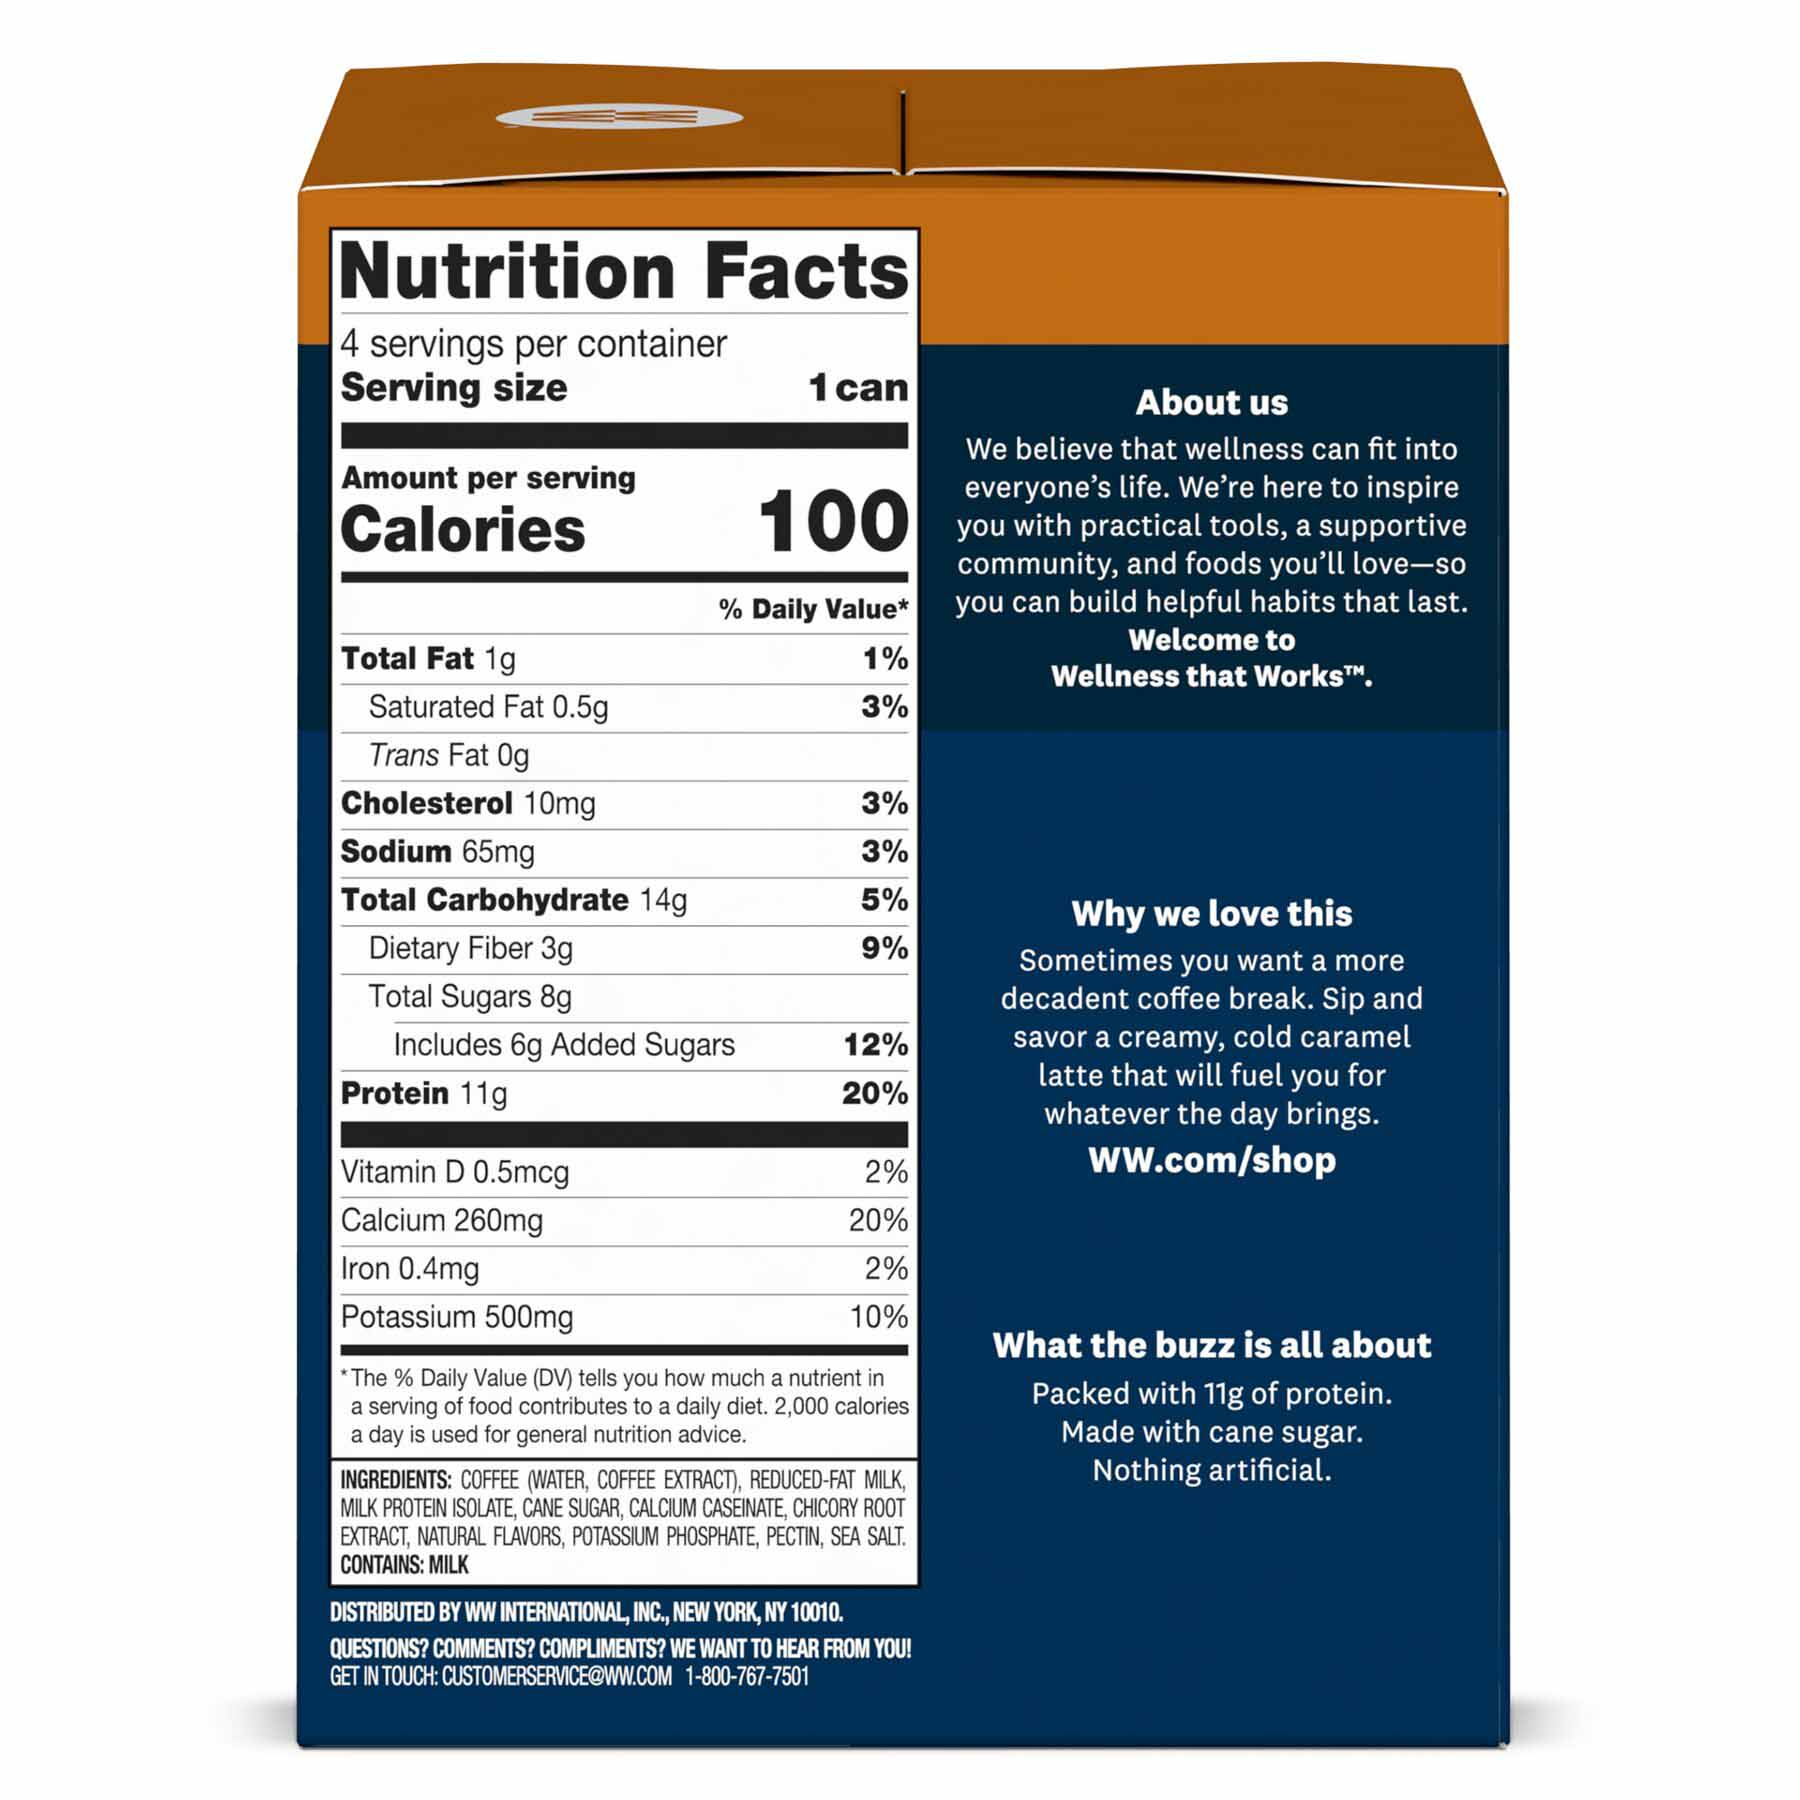 Caramel latte - nutritional info